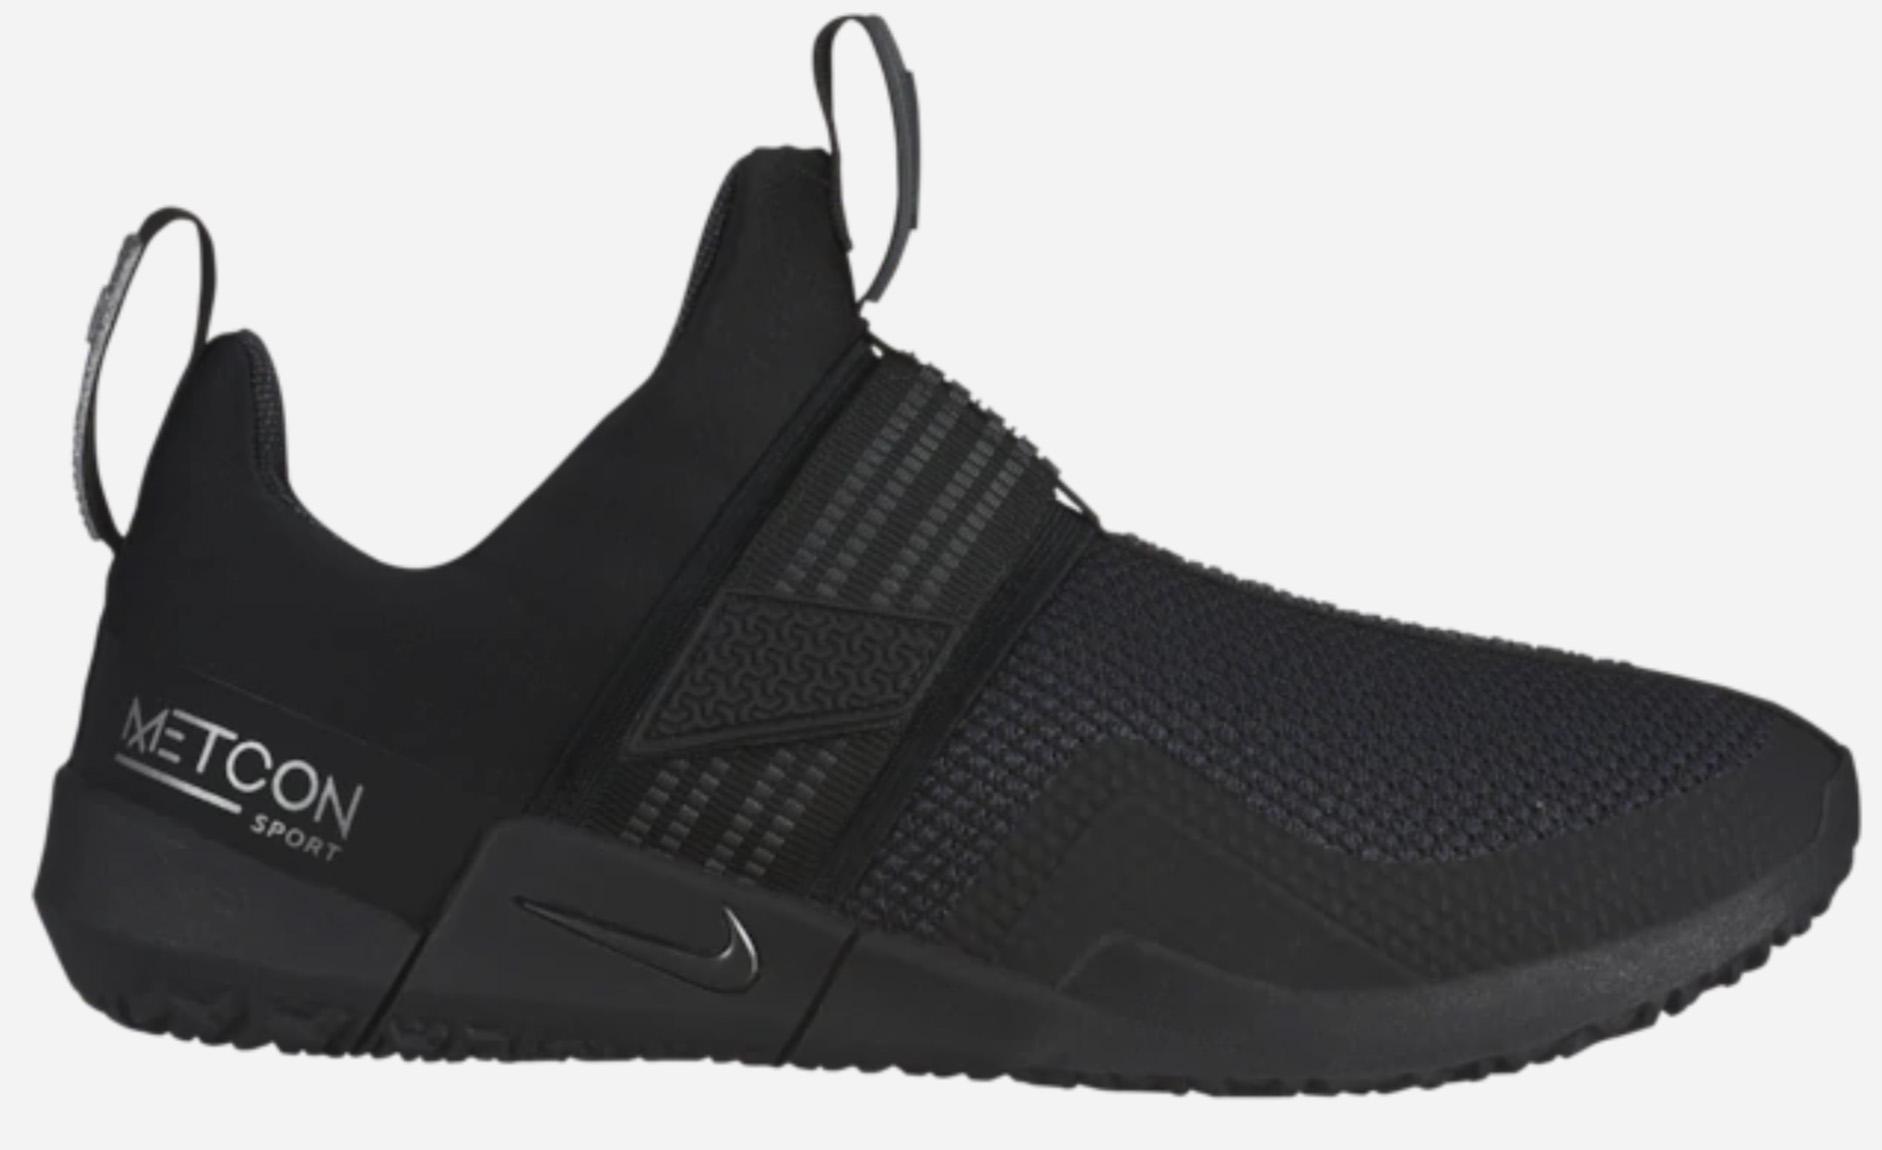 Nike Metcon Sport Black - AQ7489-003